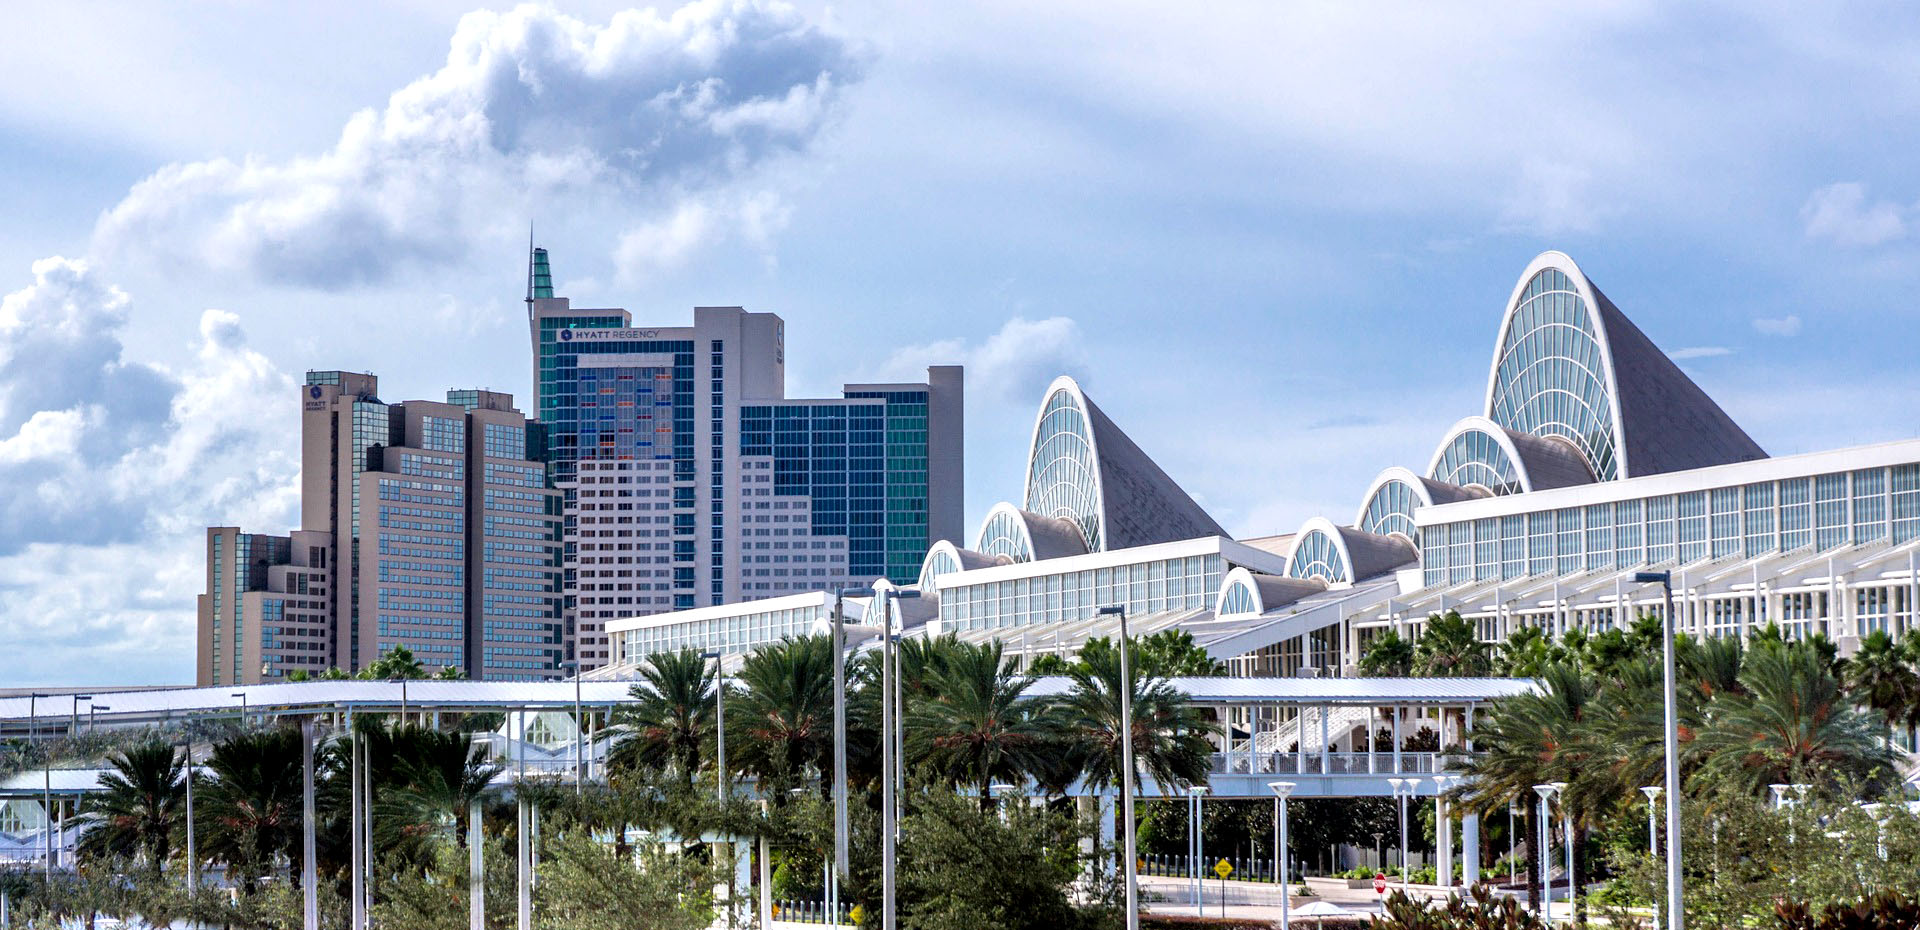 the Orlando florida skyline